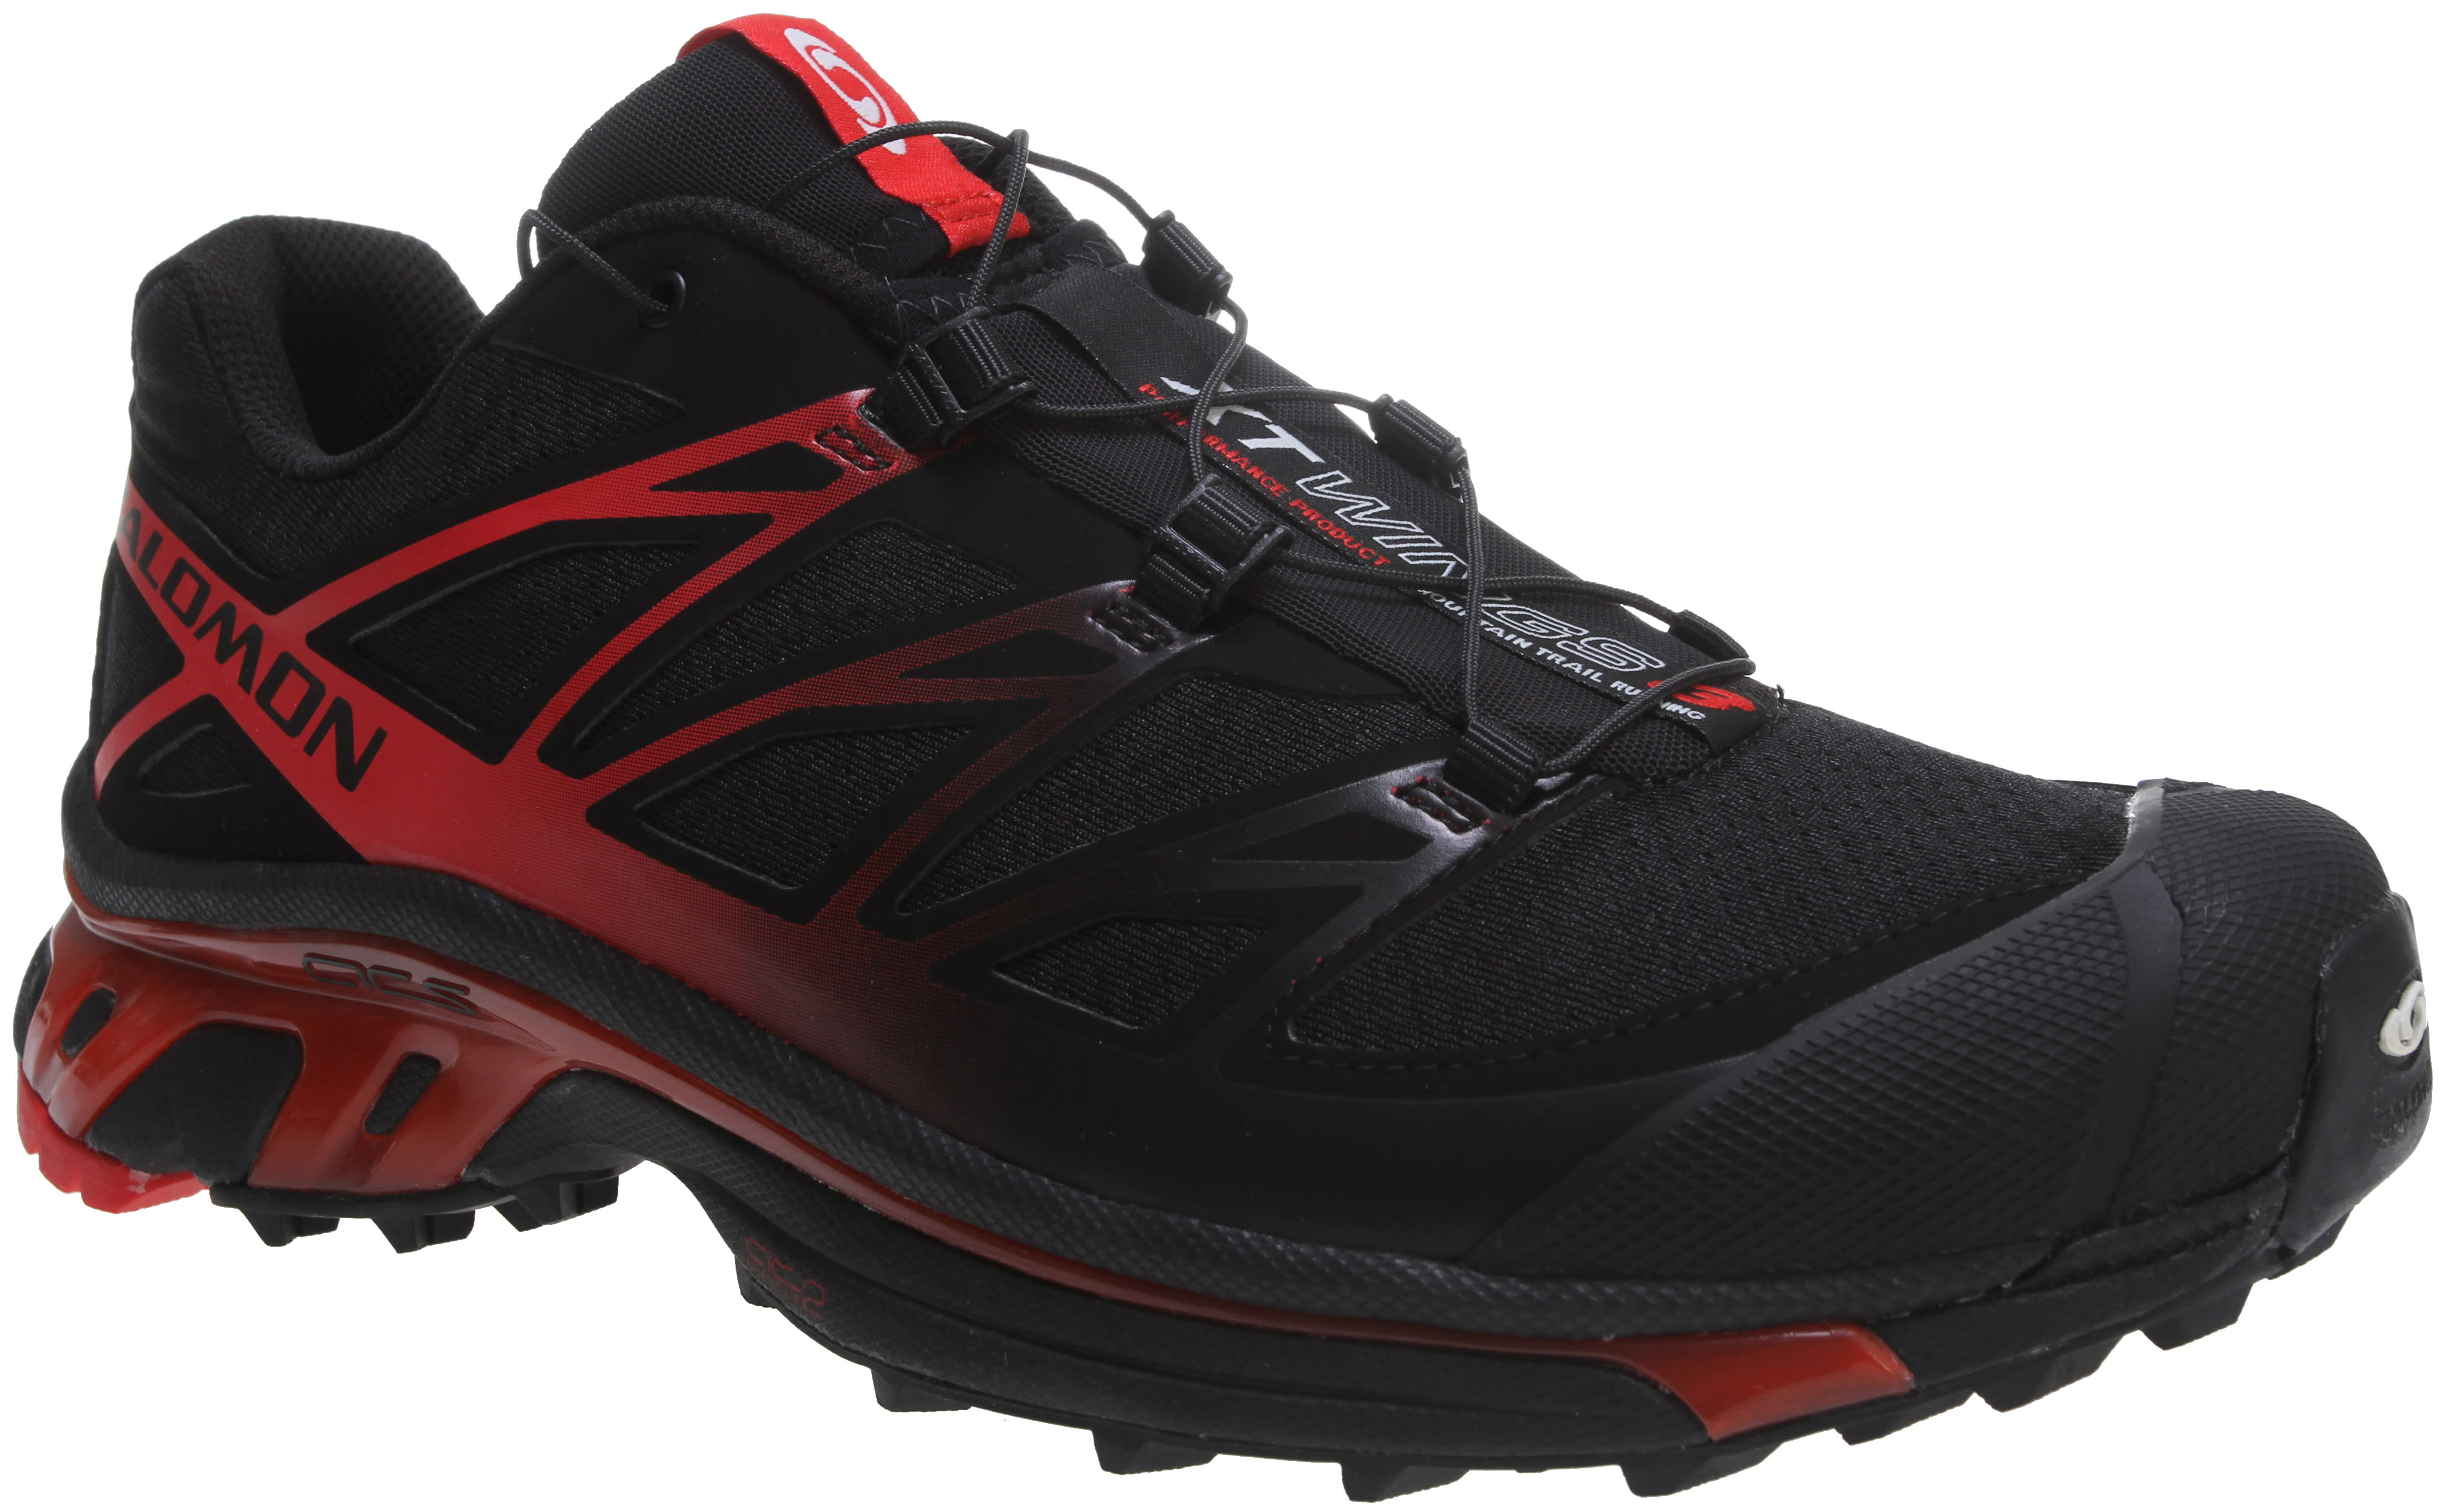 brand new 36b90 cc6fa Salomon XT Wings 3 Shoes